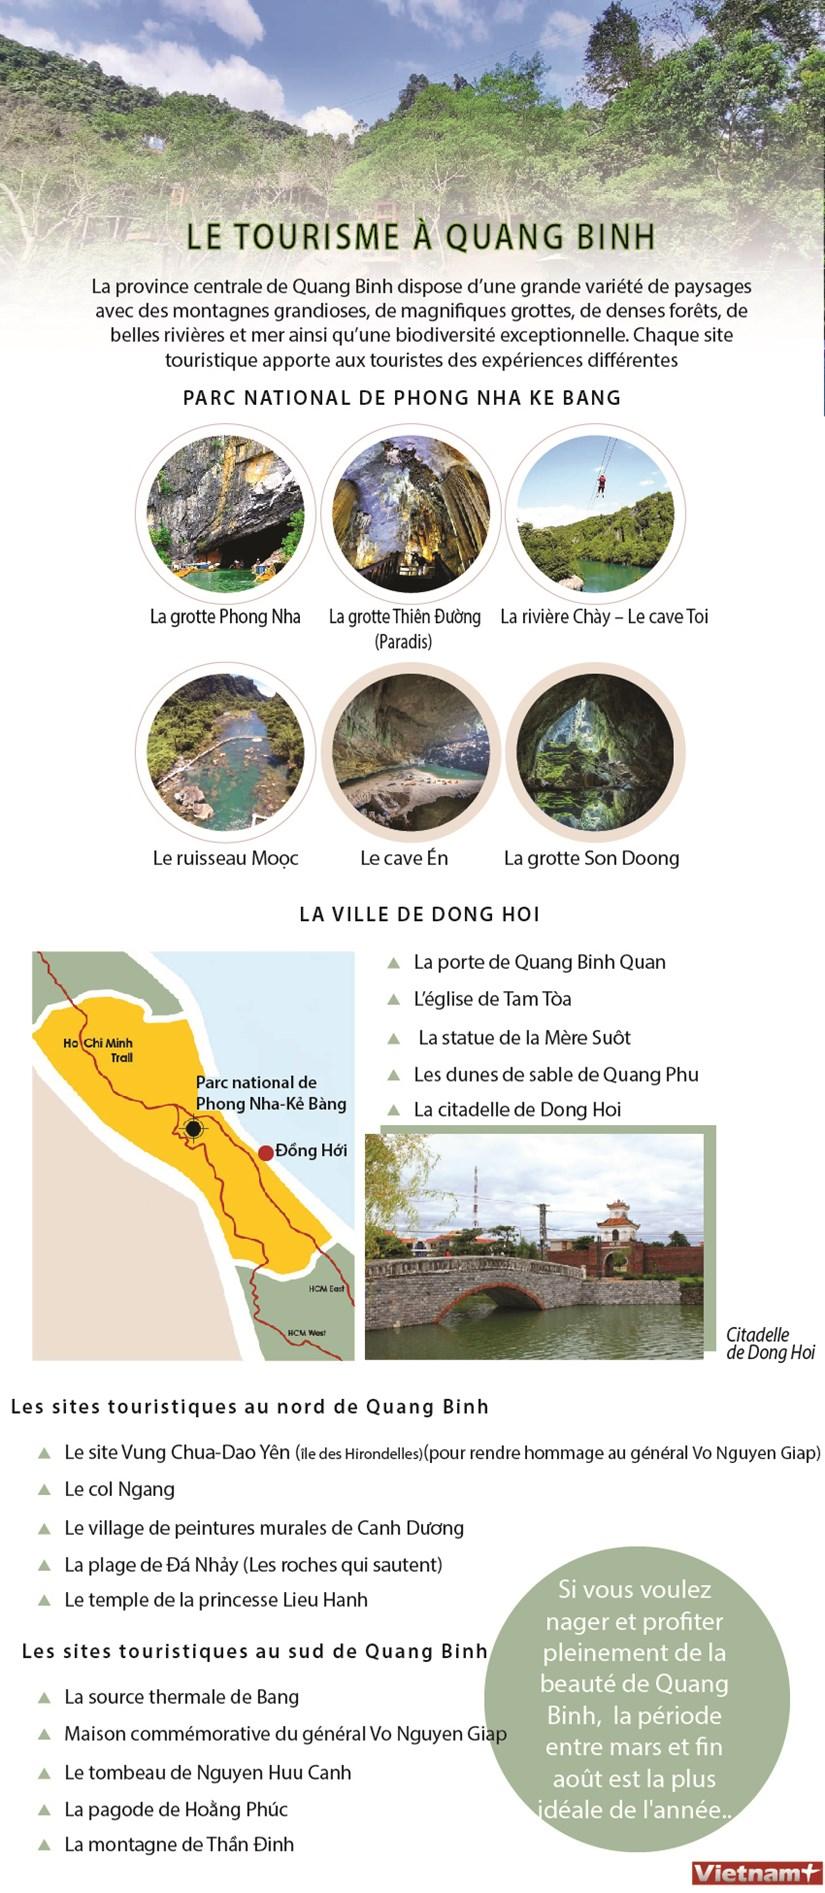 Le tourisme a Quang Binh hinh anh 1